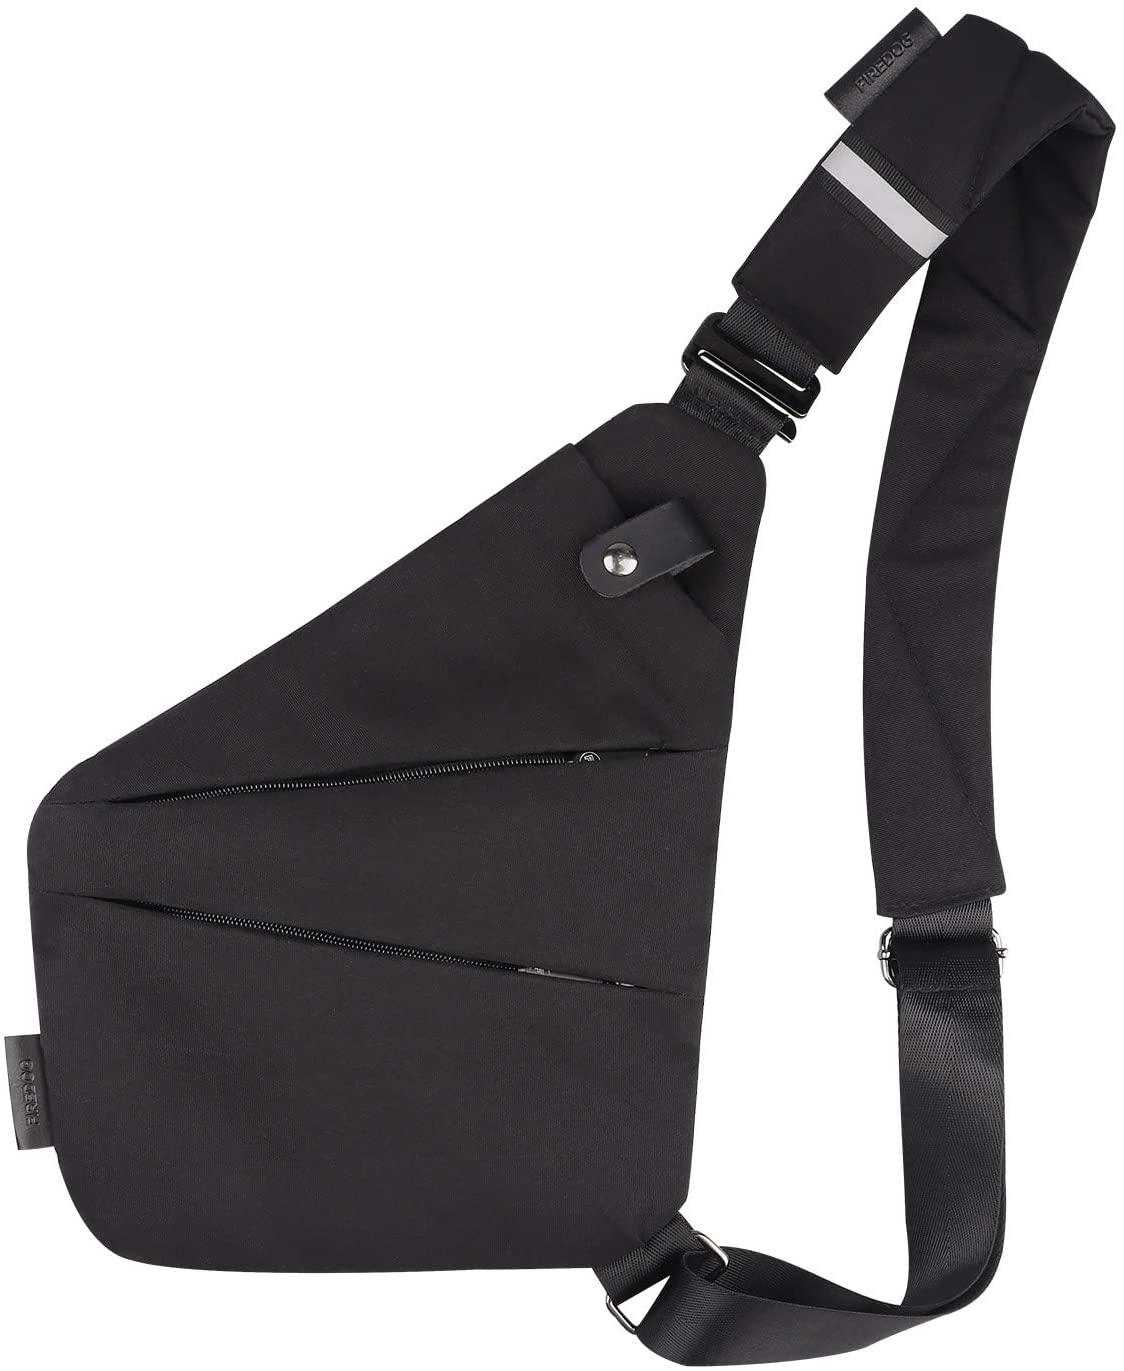 FIREDOG Smell Proof Shoulder Bag, Smell Cross Body Bag for Travel (Black)